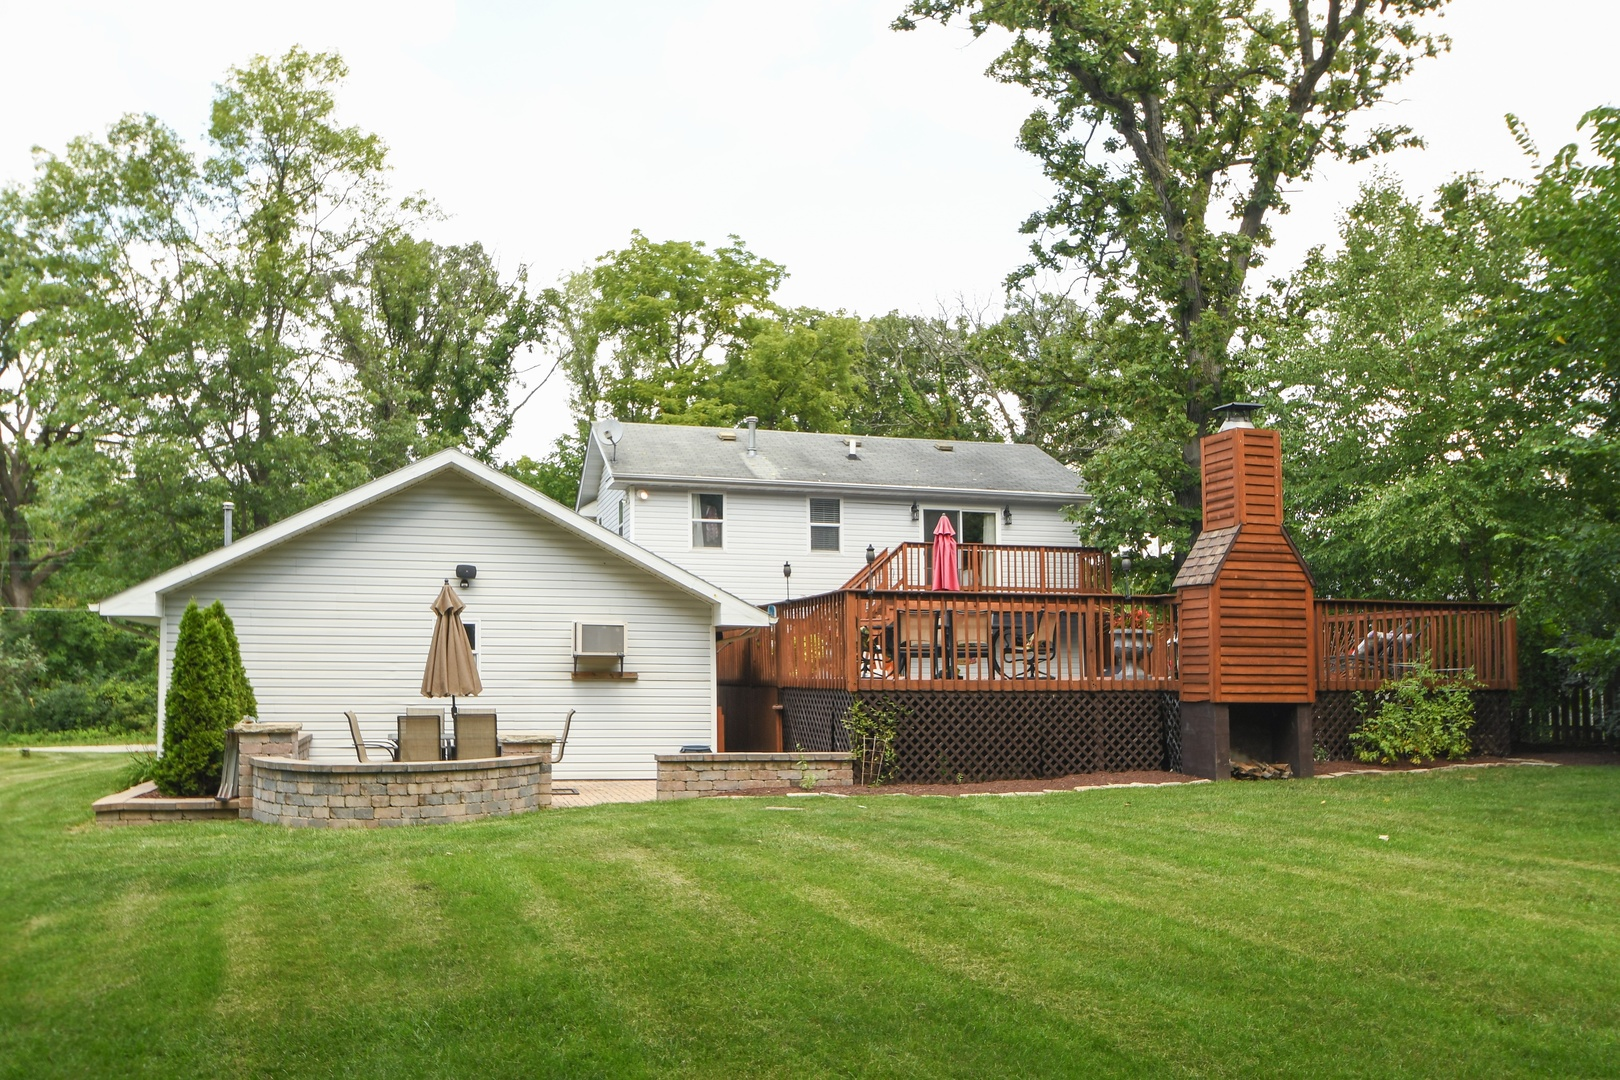 7919 West Woodvale, FRANKFORT, Illinois, 60423